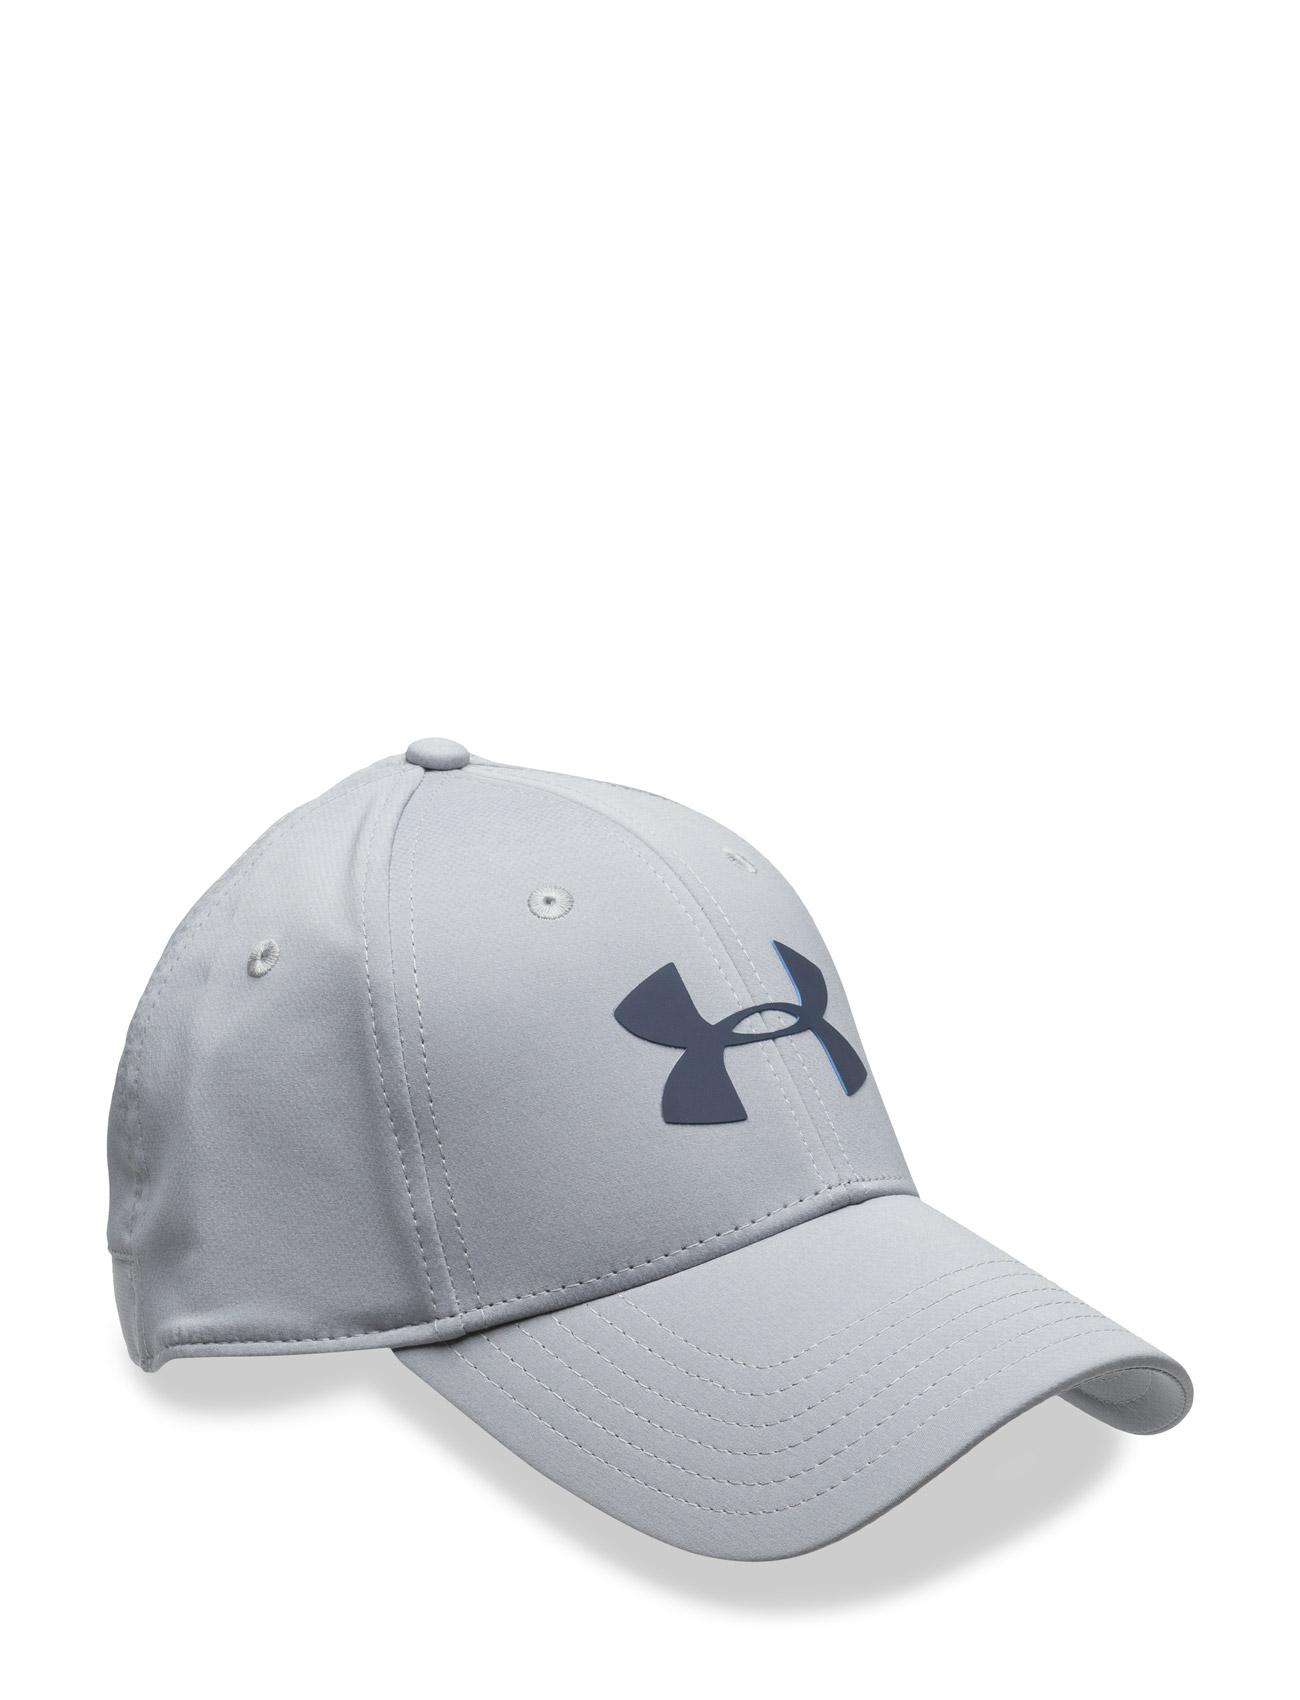 Men'S Ua Golf Headline Cap Under Armour Sports accessories til Herrer i